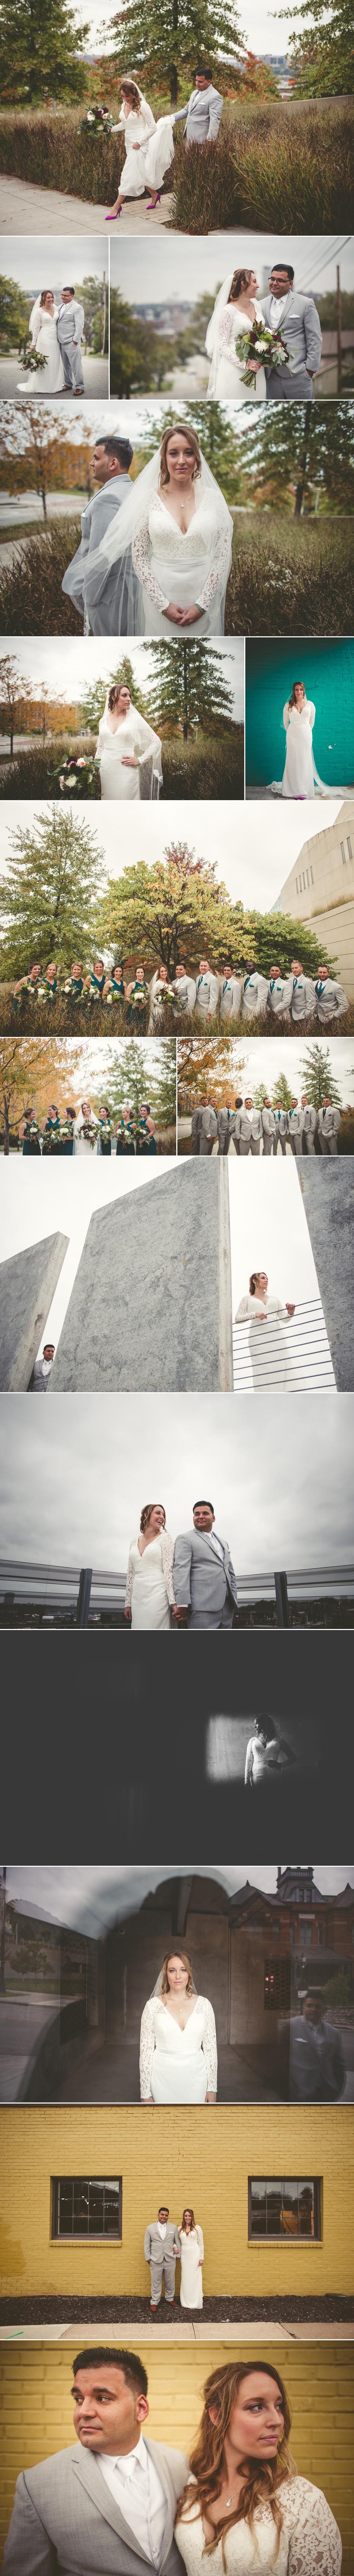 jason_domingues_photography_best_kansas_city_photographer_kc_weddings_28_event_space_0002